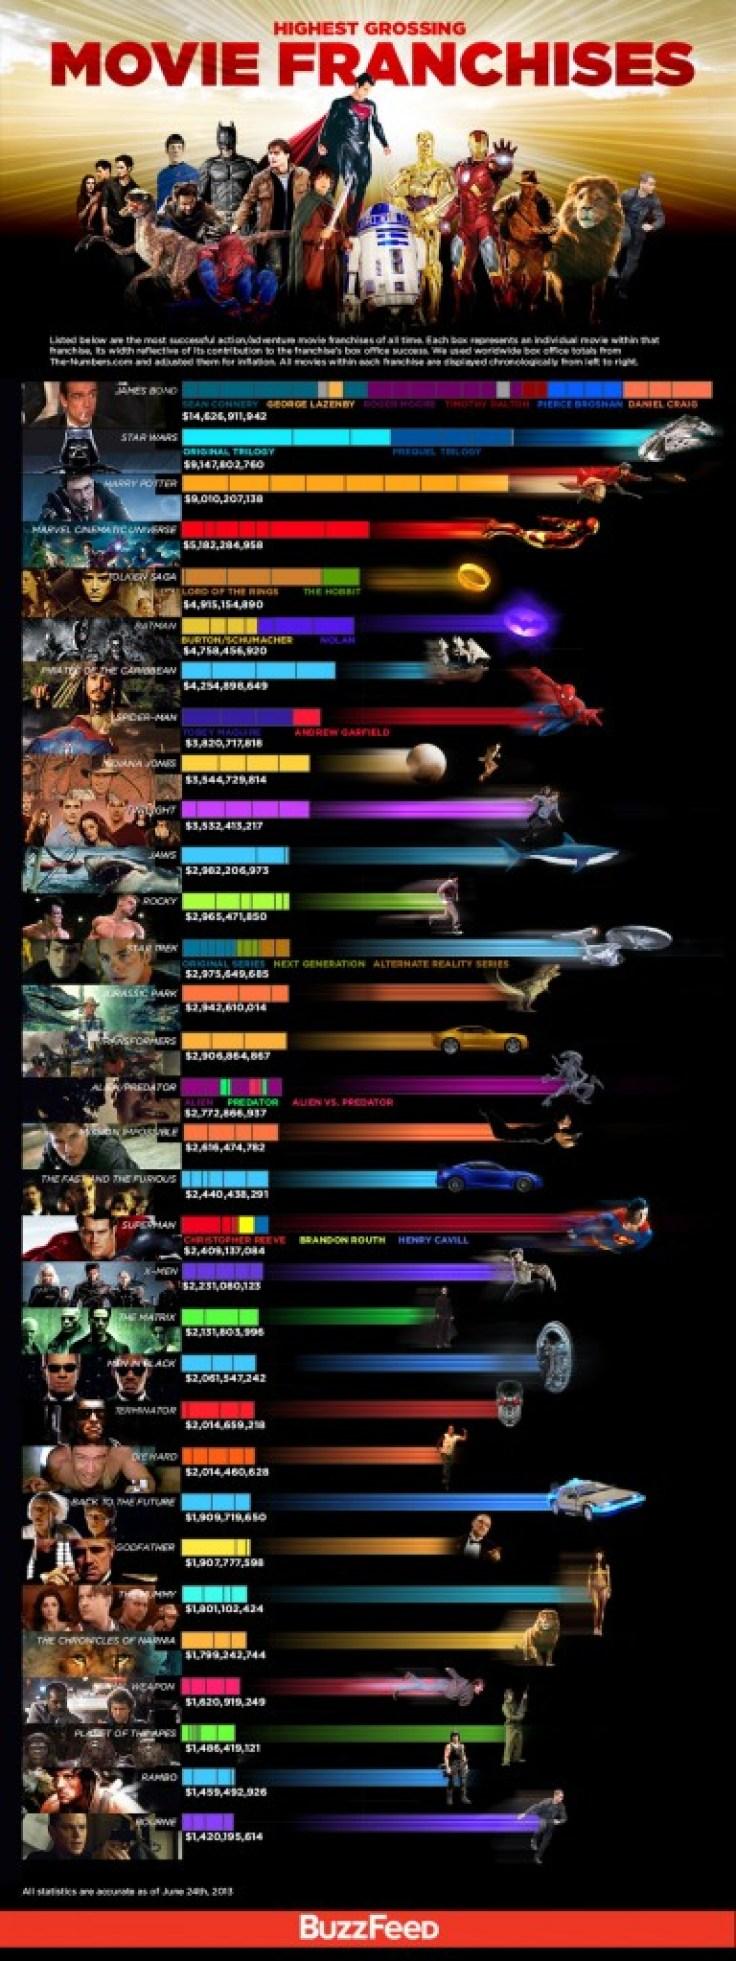 highest-grossing-movie-franchises-large